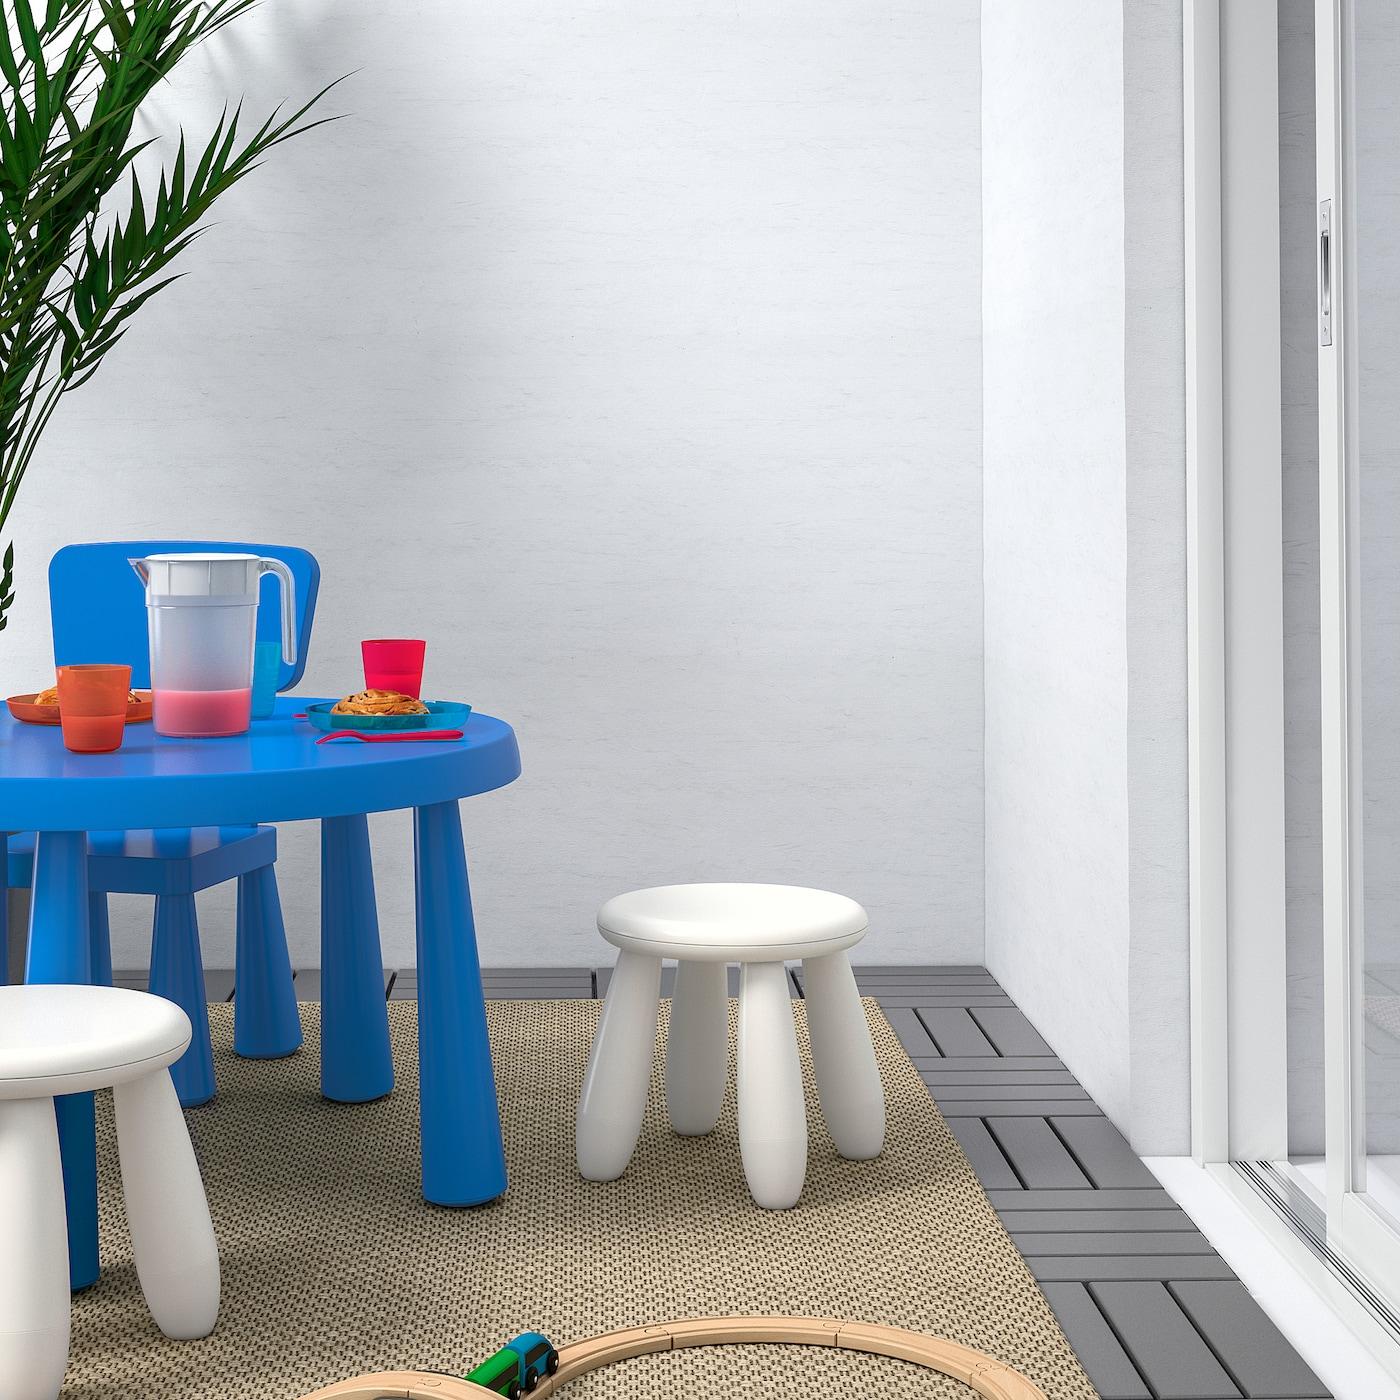 MAMMUT Children's stool, in/outdoor/white